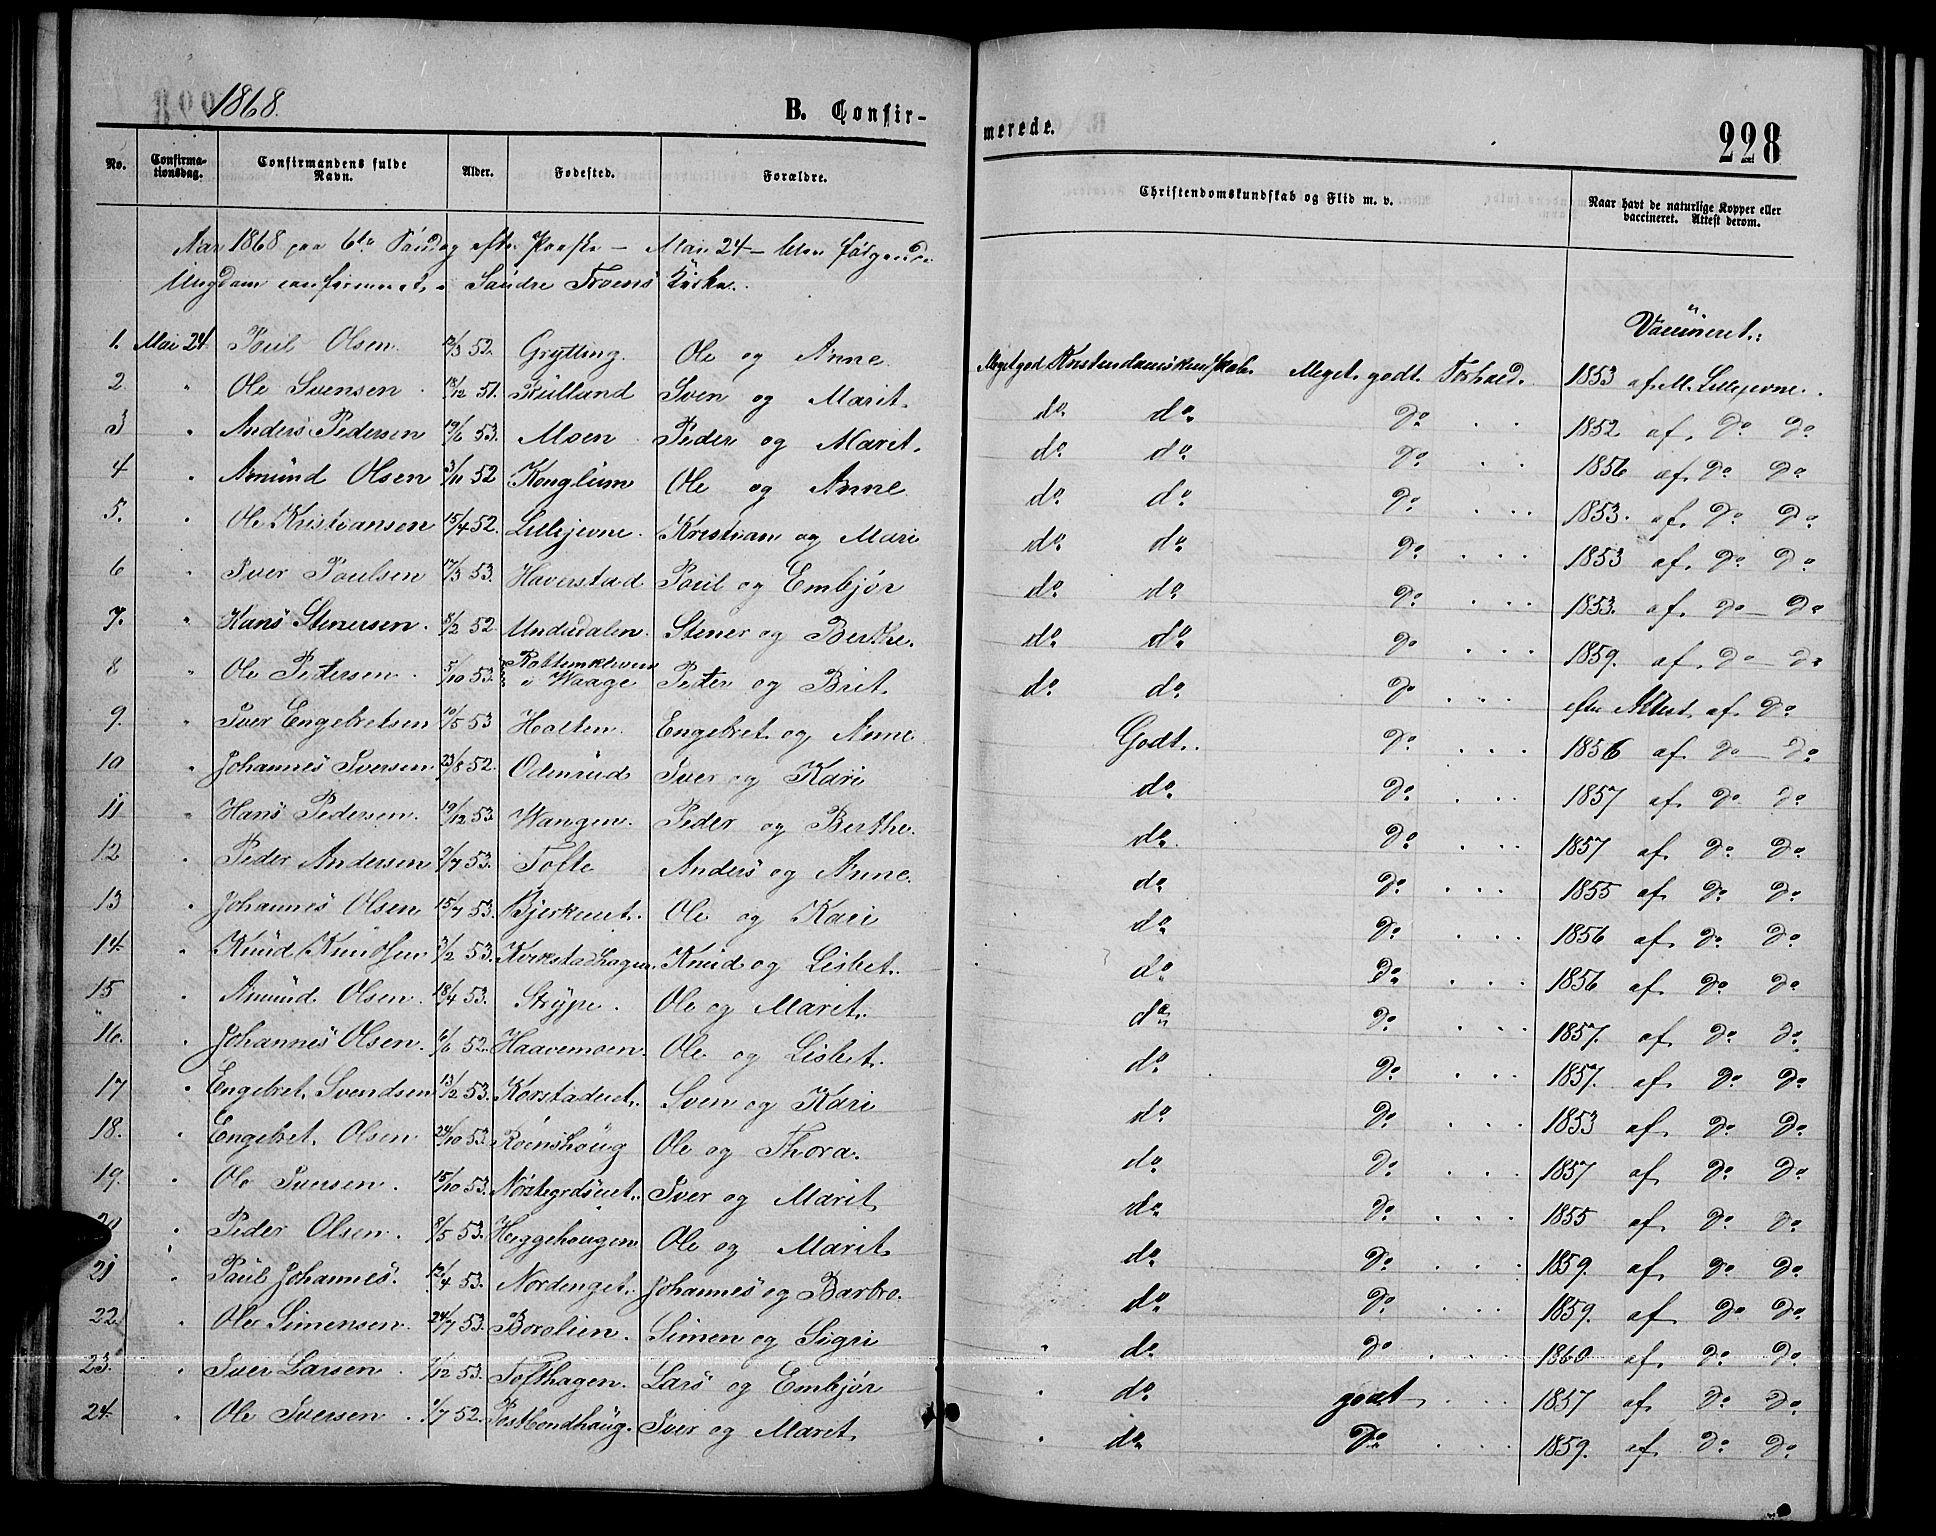 SAH, Sør-Fron prestekontor, H/Ha/Hab/L0002: Klokkerbok nr. 2, 1864-1883, s. 228